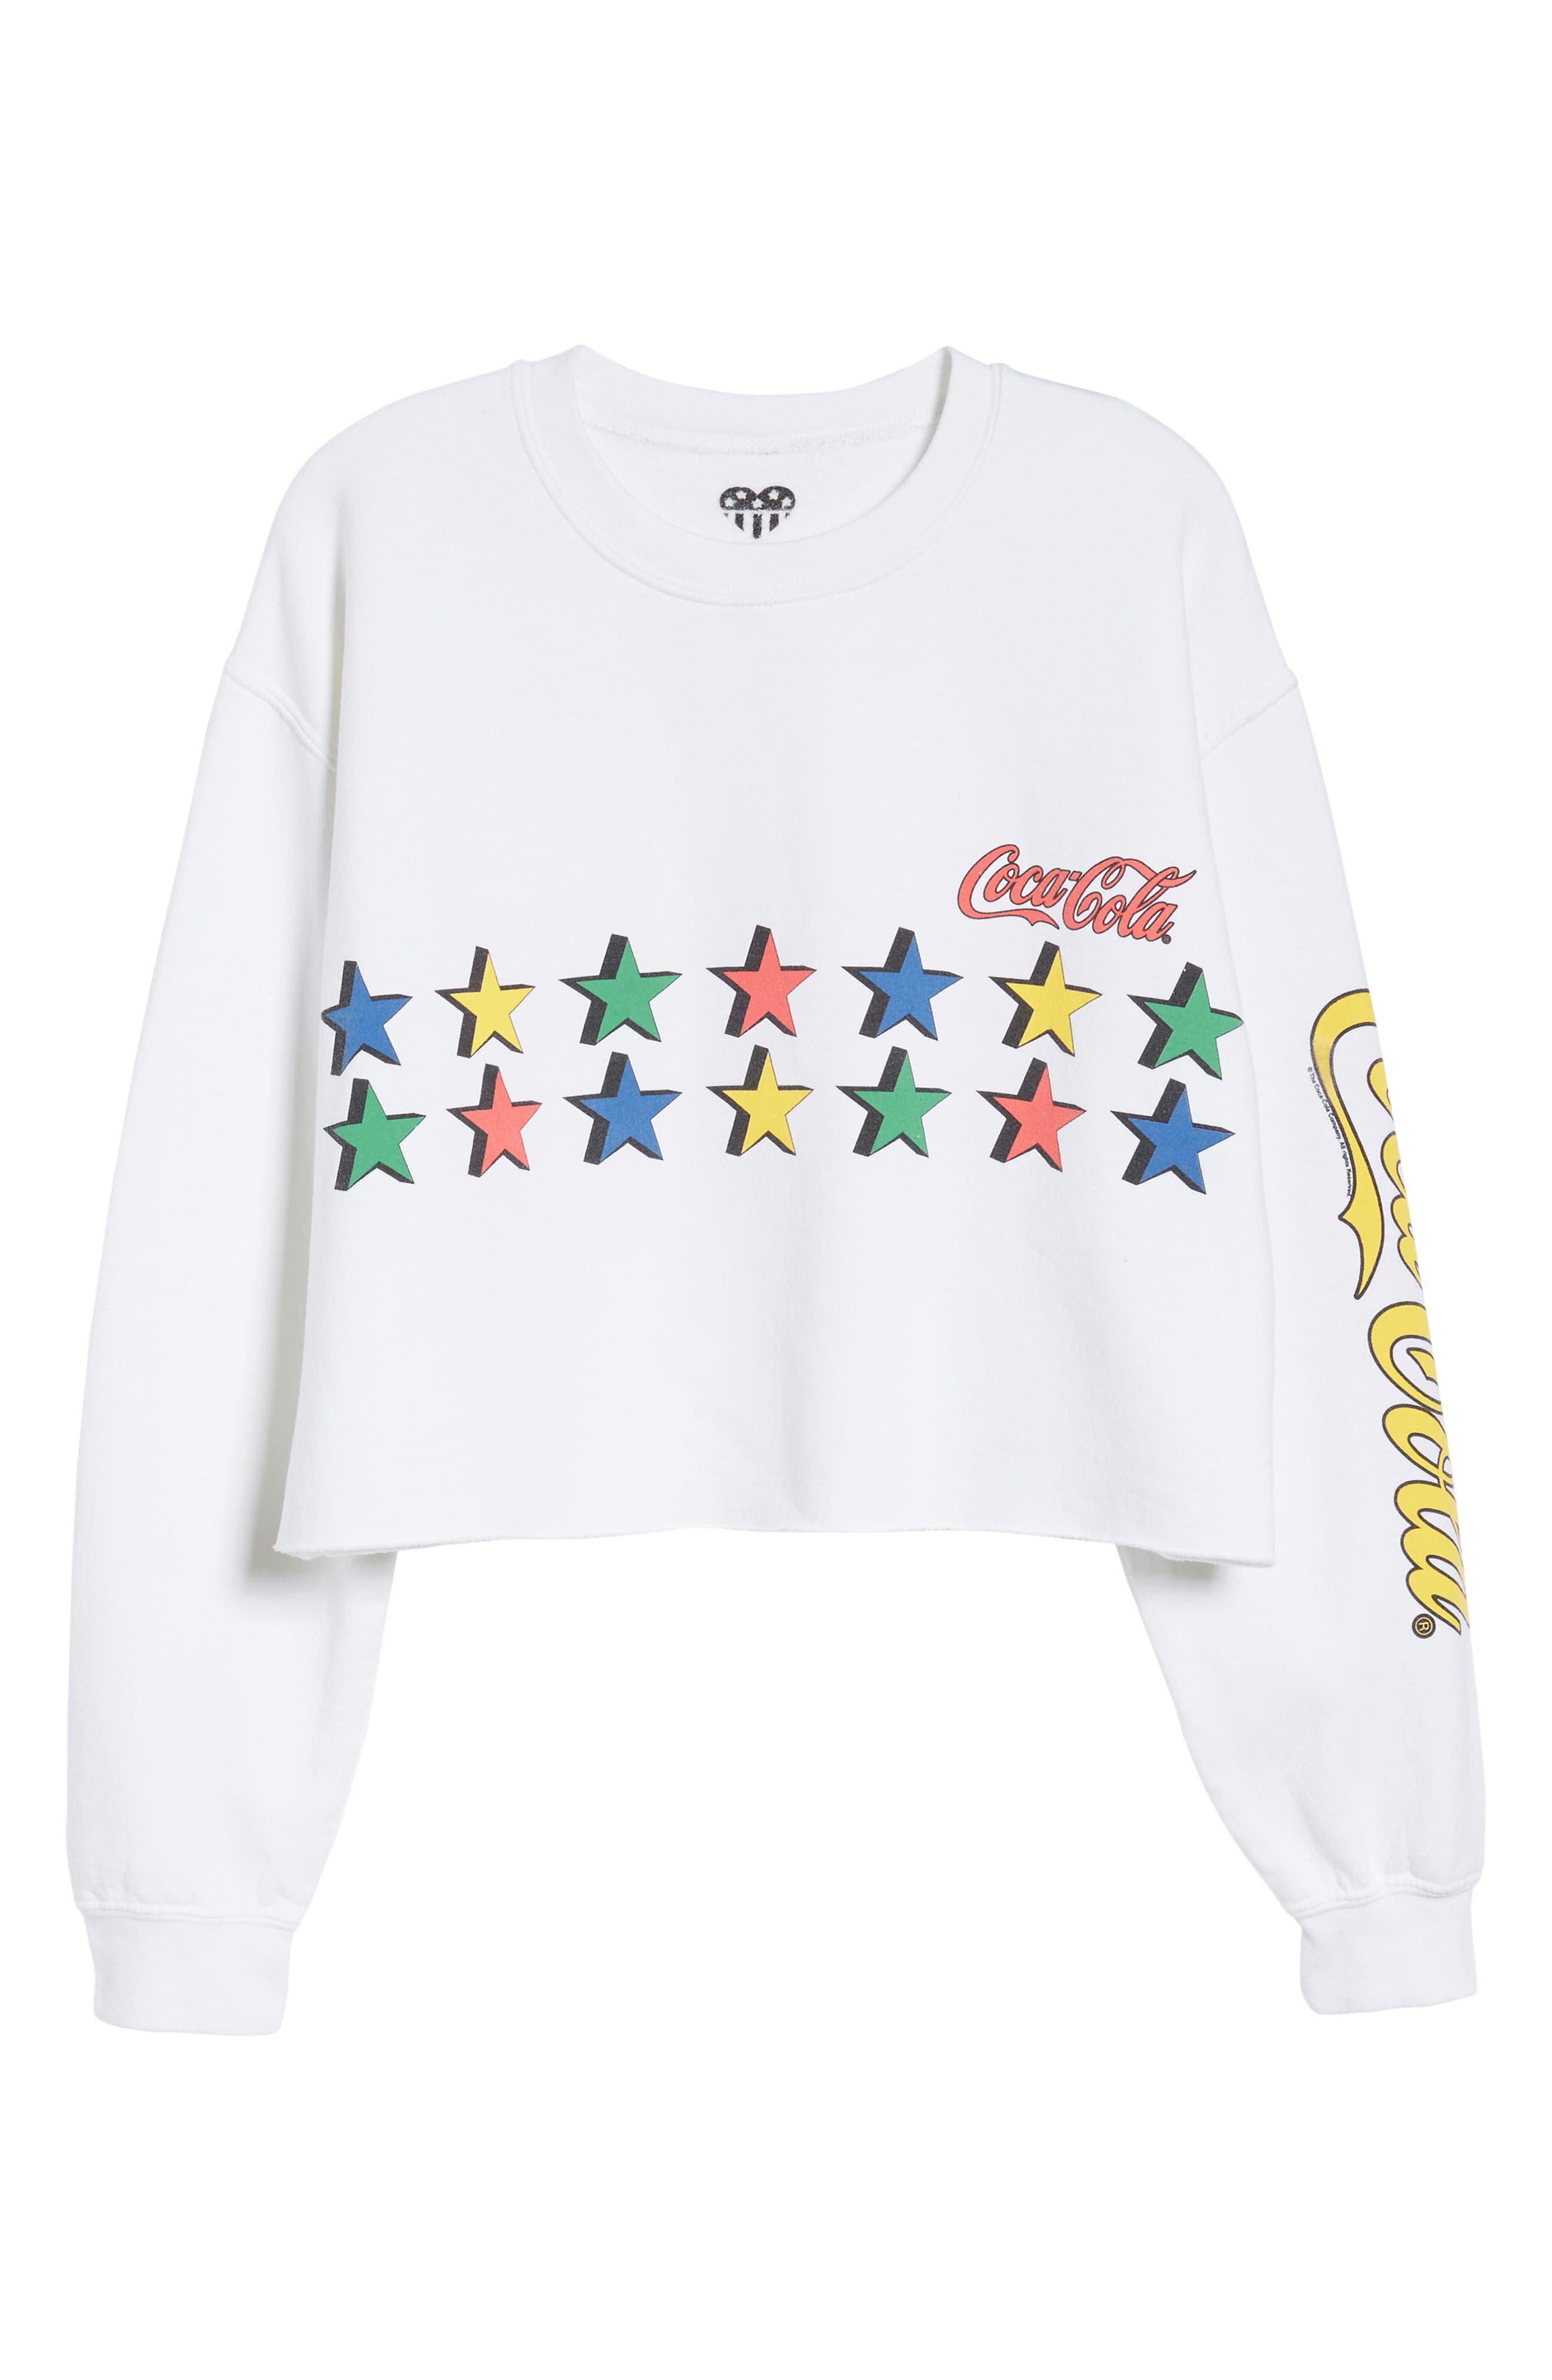 Coke Stars Crop Sweatshirt,                             Alternate thumbnail 6, color,